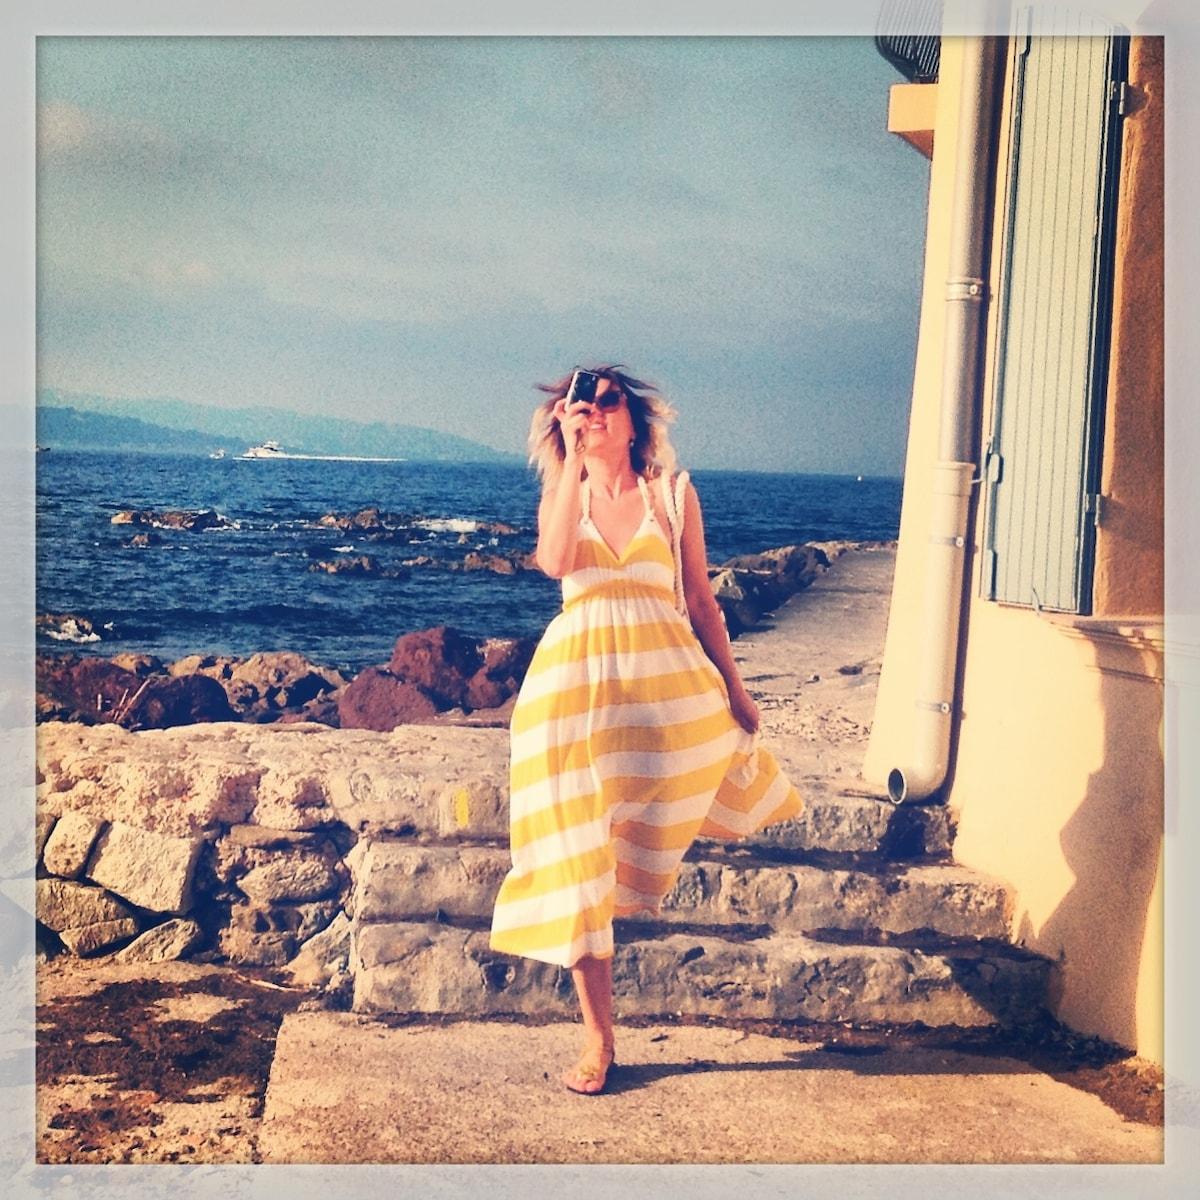 Yulia from Nice